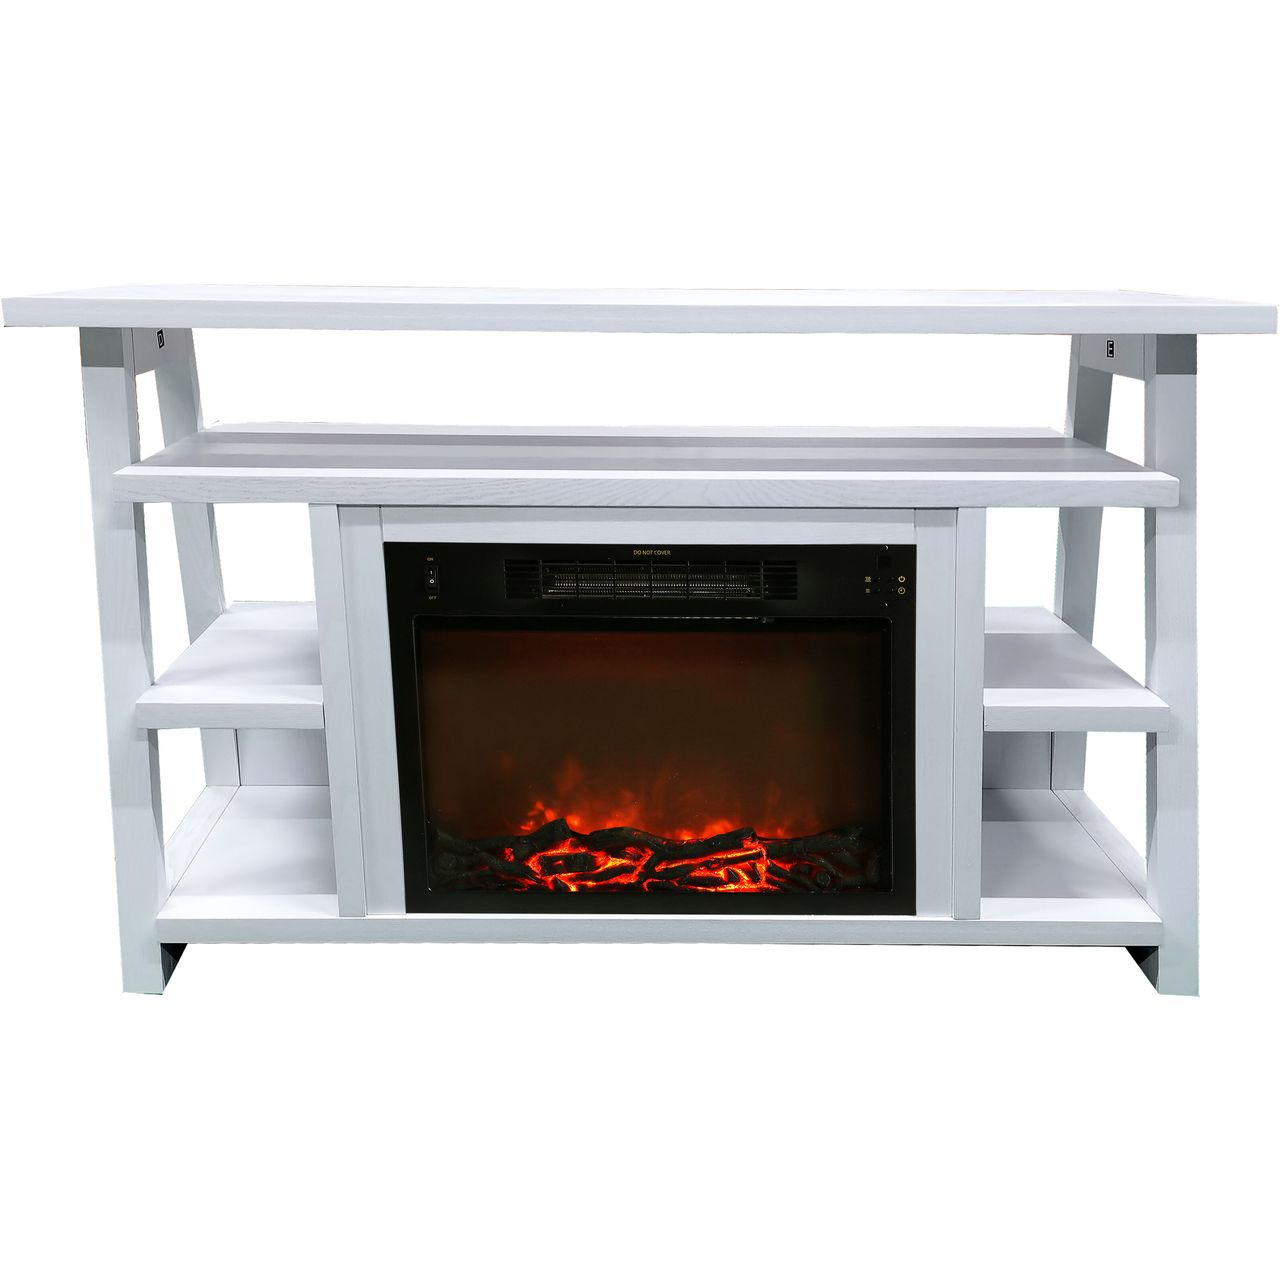 "Cambridge 32"" Sawyer Electric Fireplace Mantel/Logs - White"